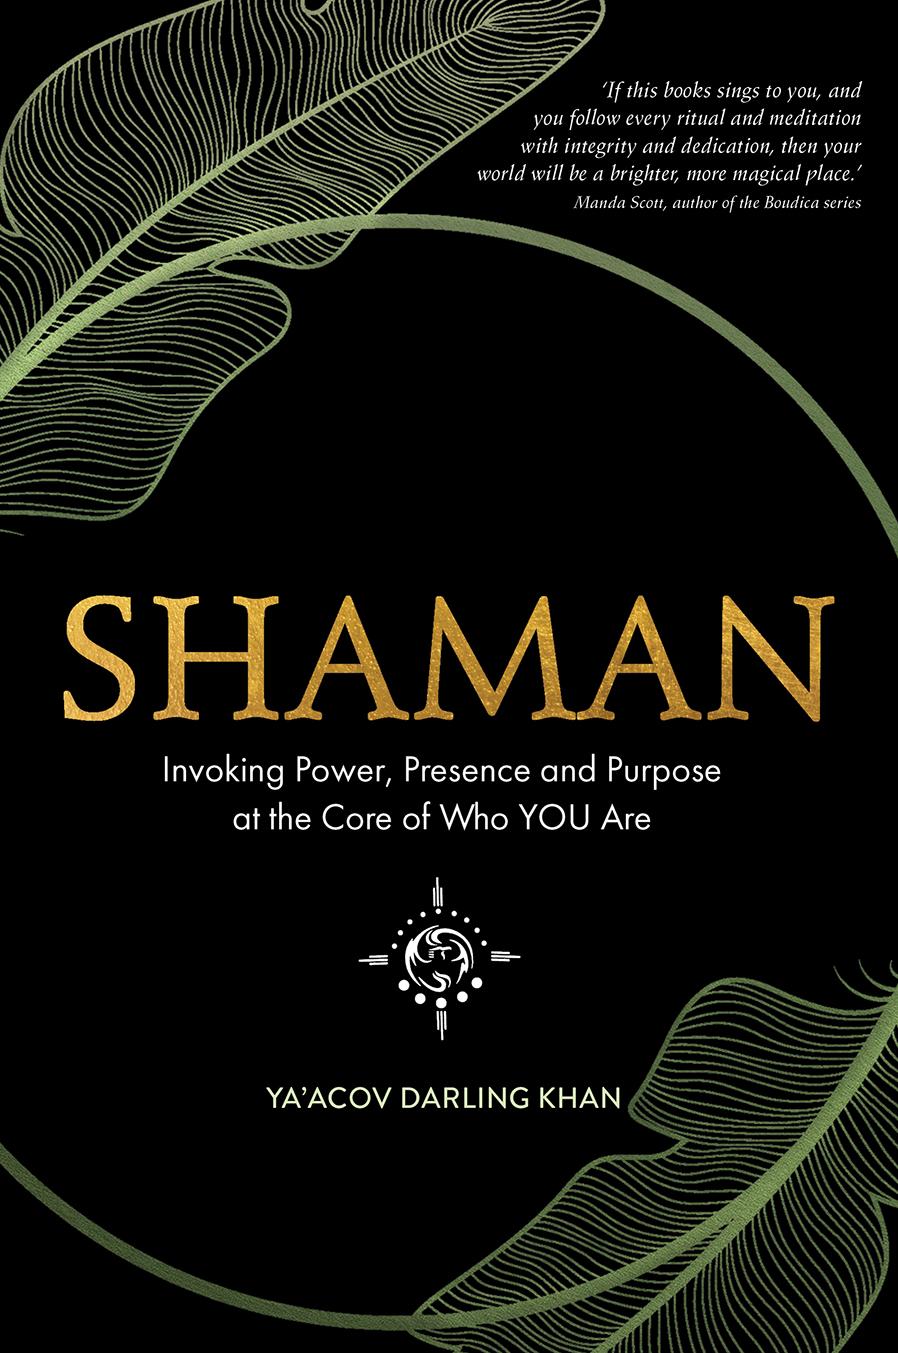 Shaman by Ya'Acov Darling Khan